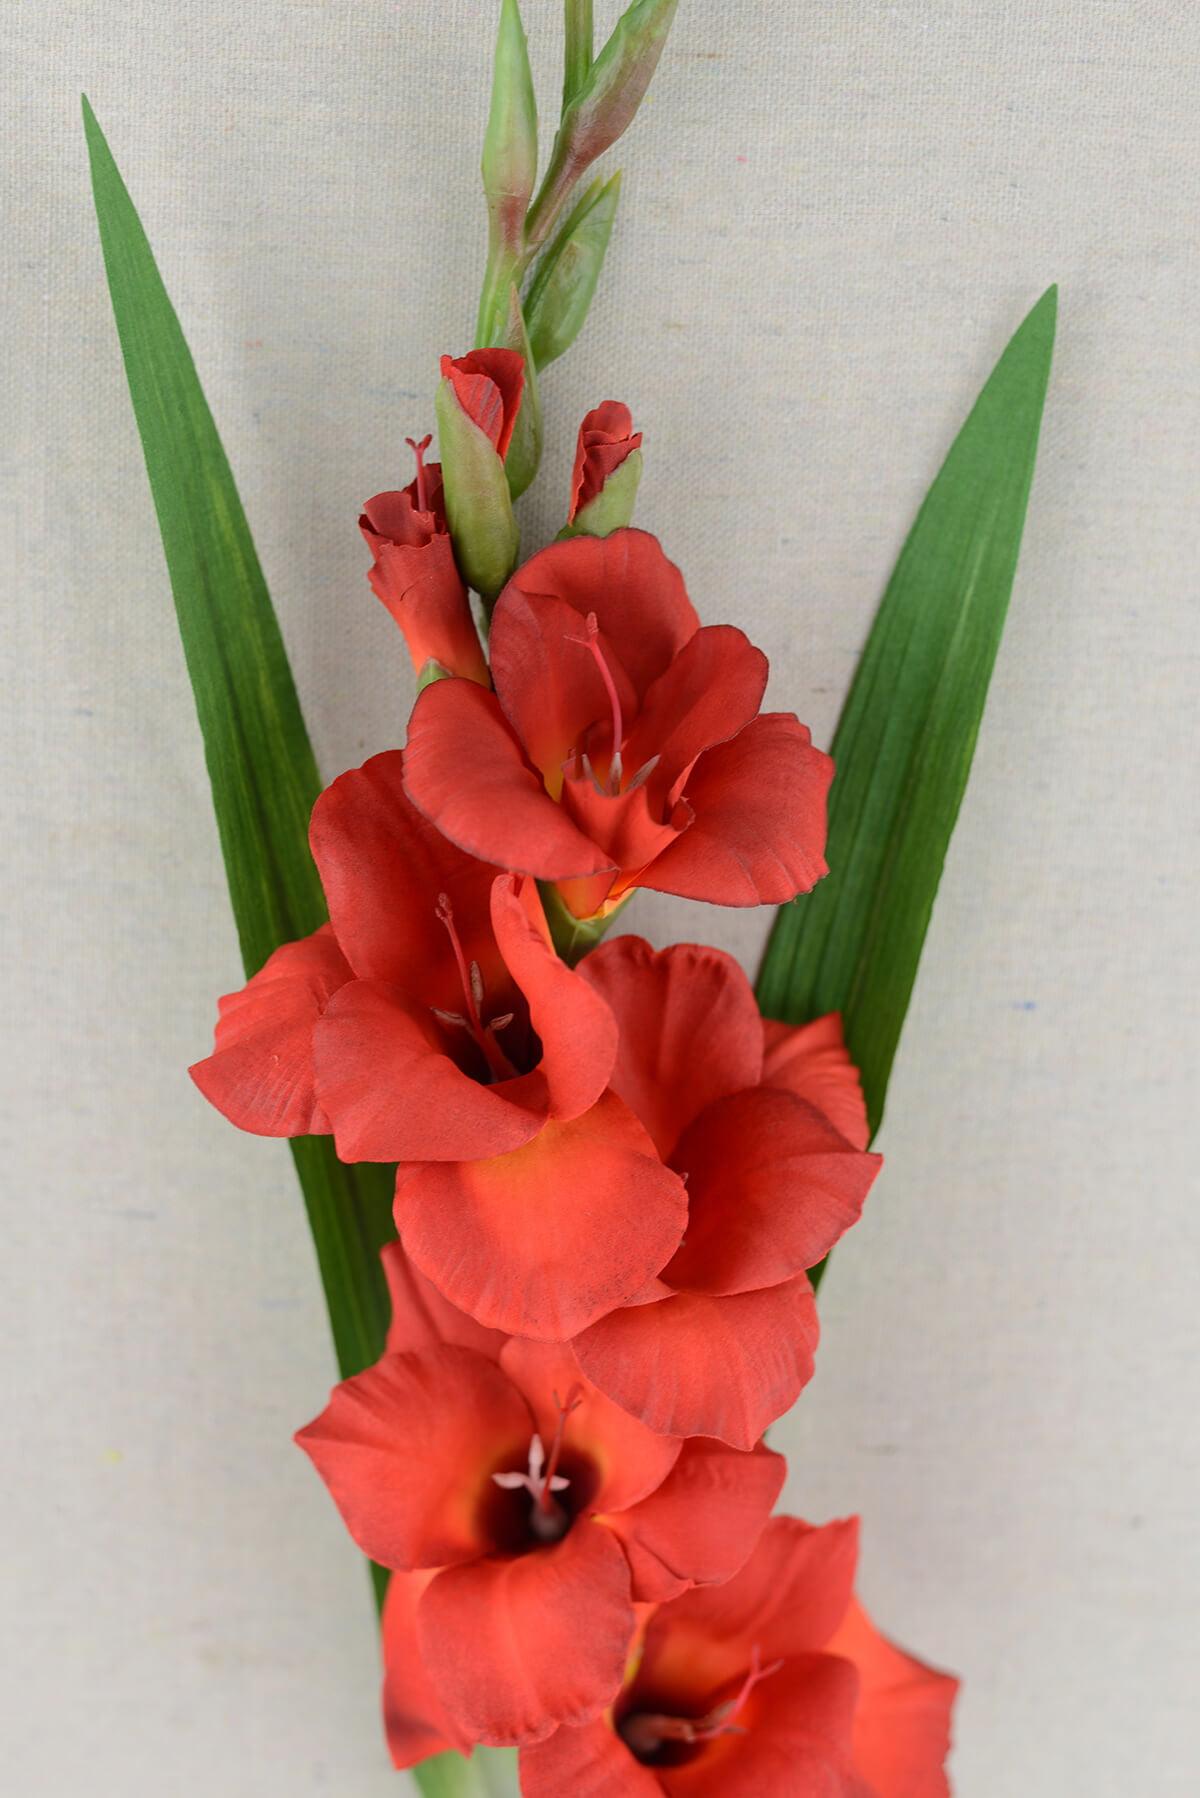 Gladiolus Flower Red 33 Inches Walmartcom